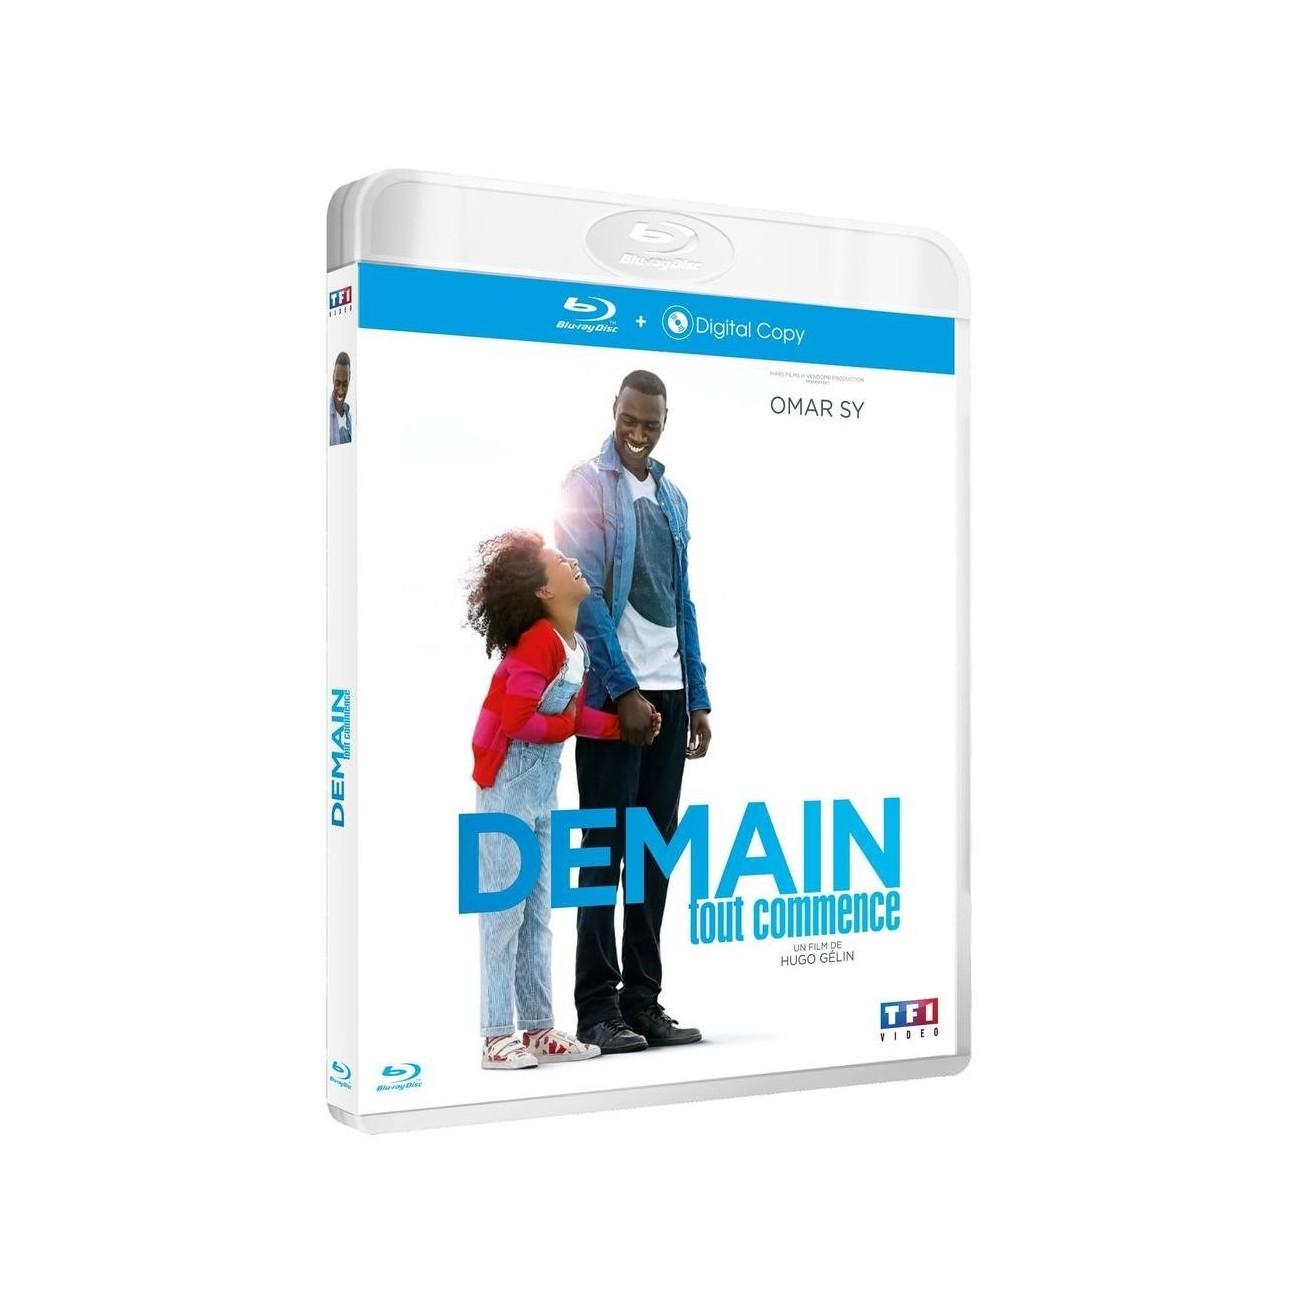 Demain tout commence [Italia] [Blu-ray]